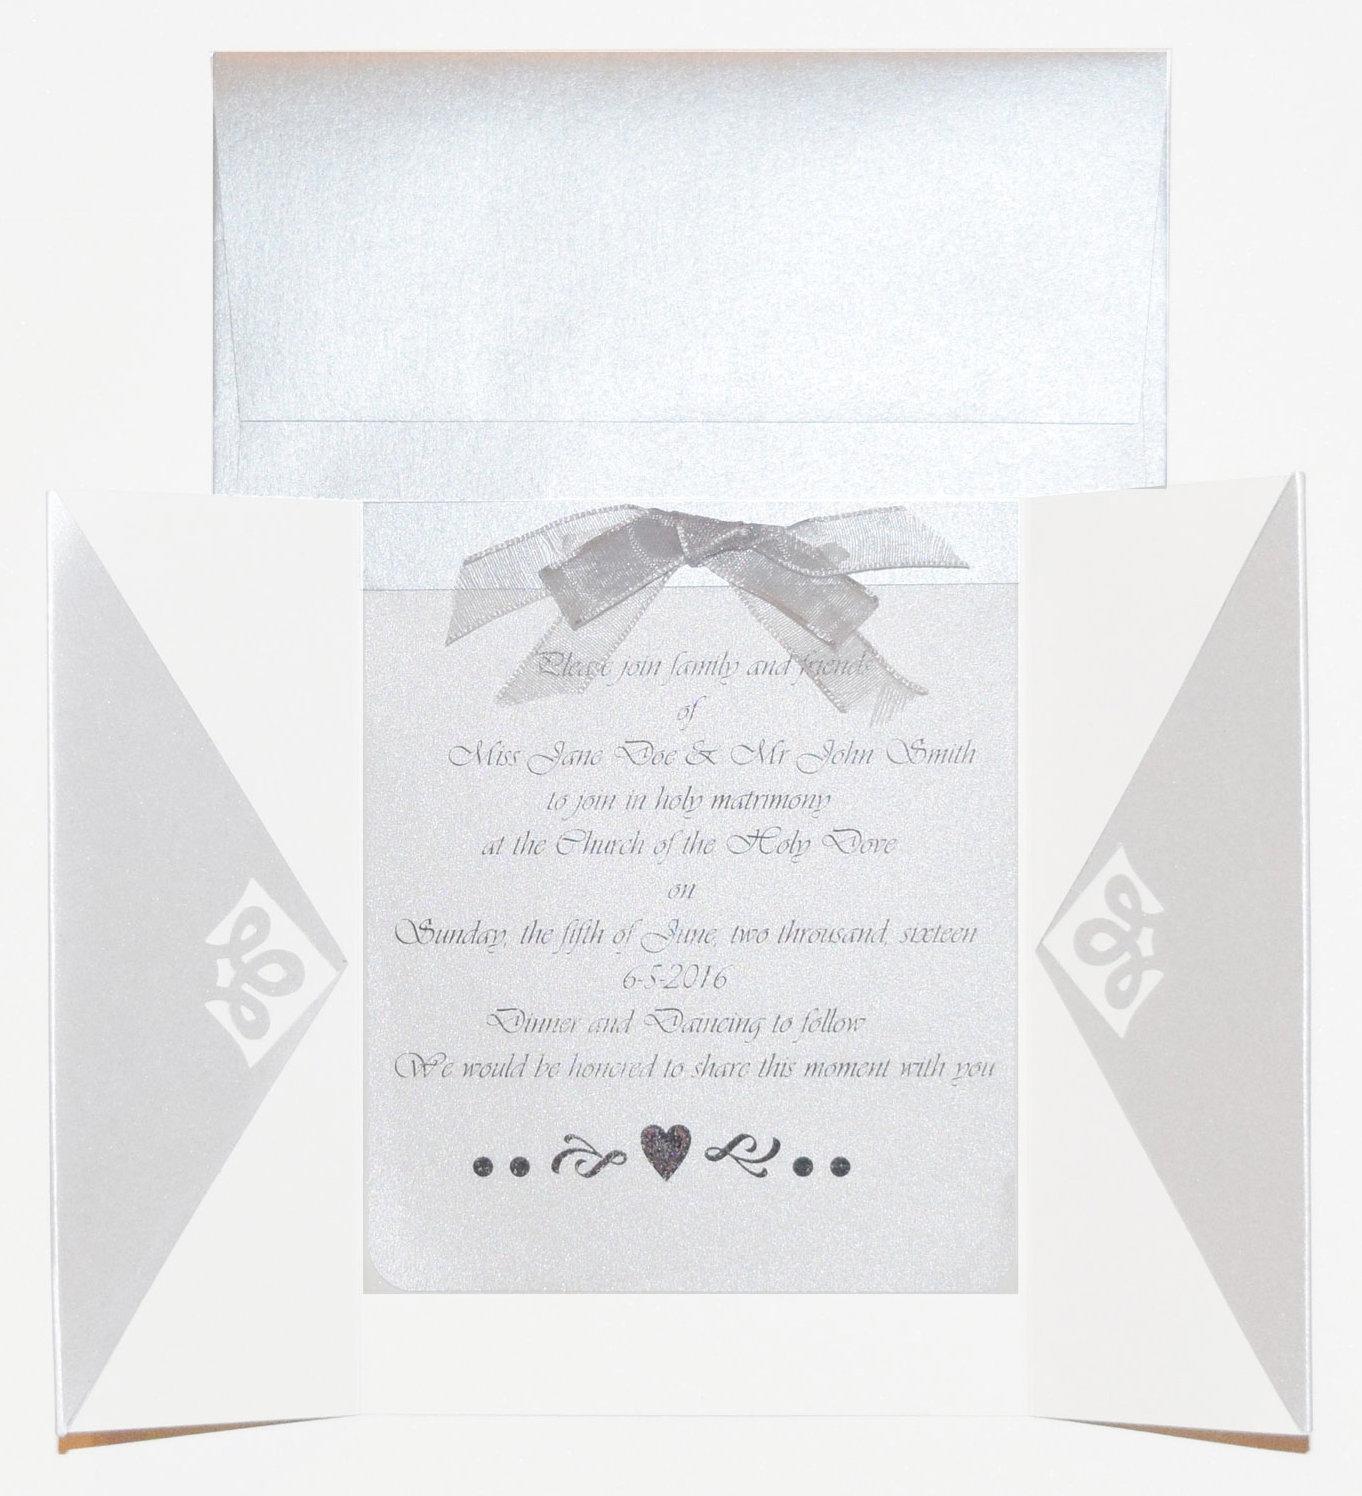 Shimmer Paper Wedding Invitation sheer wedding joy and shimmer paper perfection! - Wedding 2016 shimmer papers invite - Sheer Wedding Joy and Shimmer Paper Perfection!